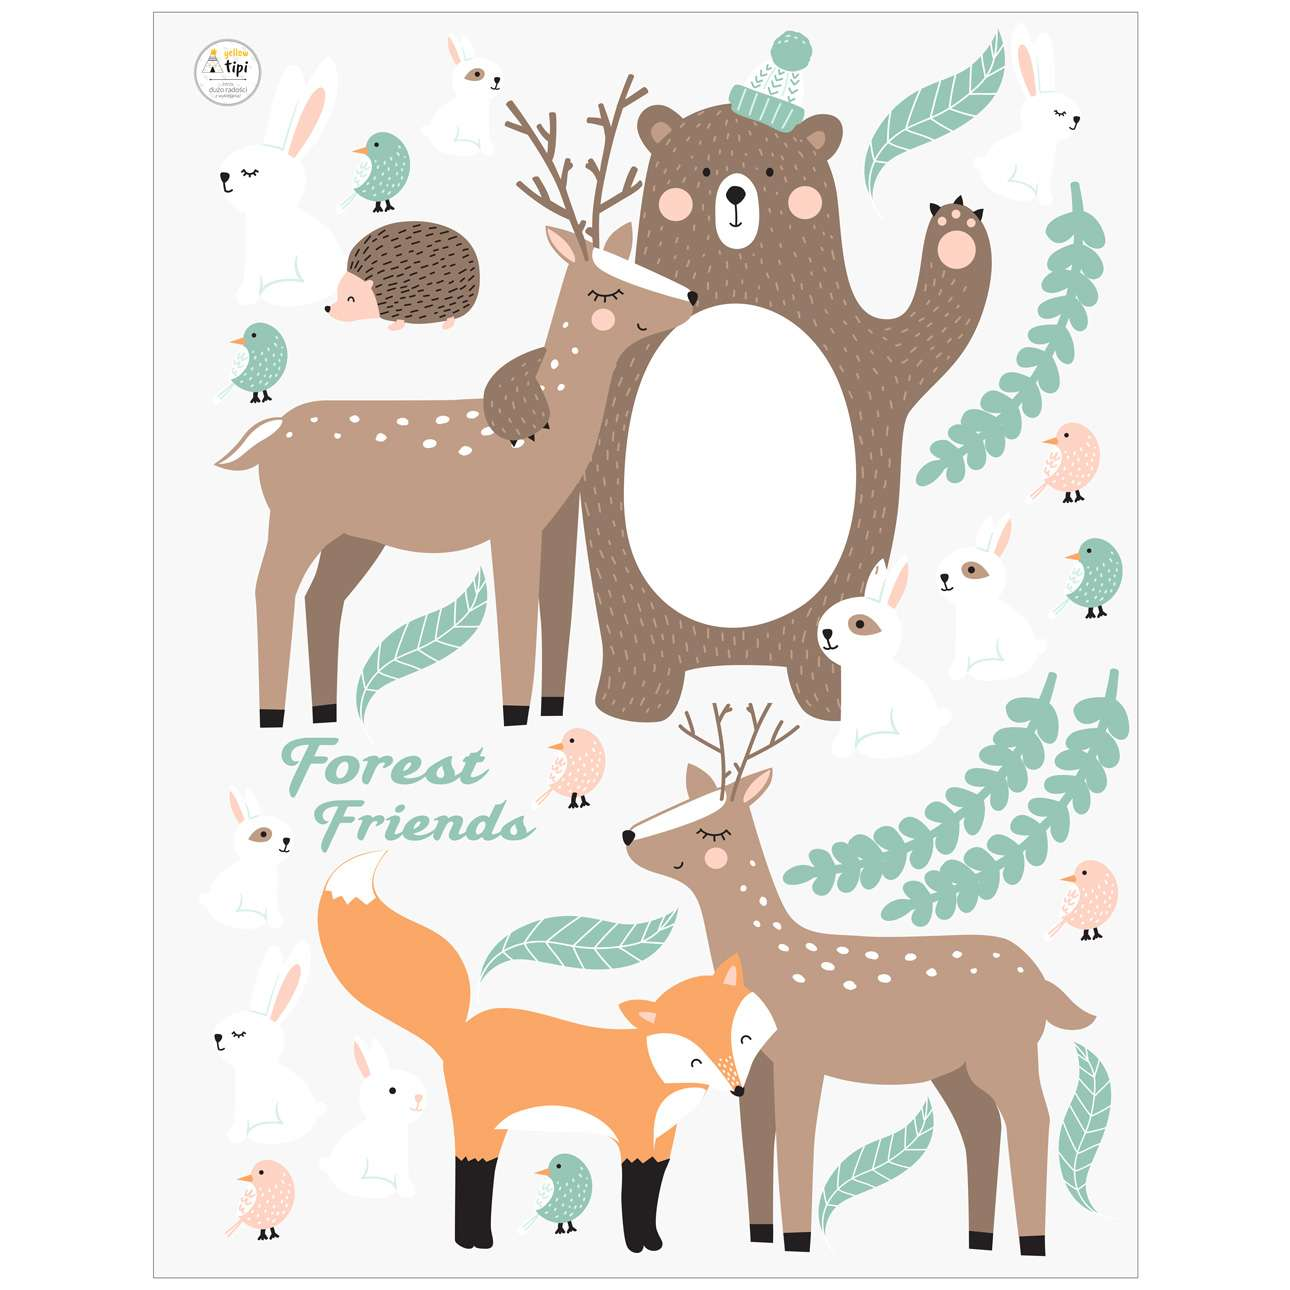 Aufkleber-Set Forest Friends